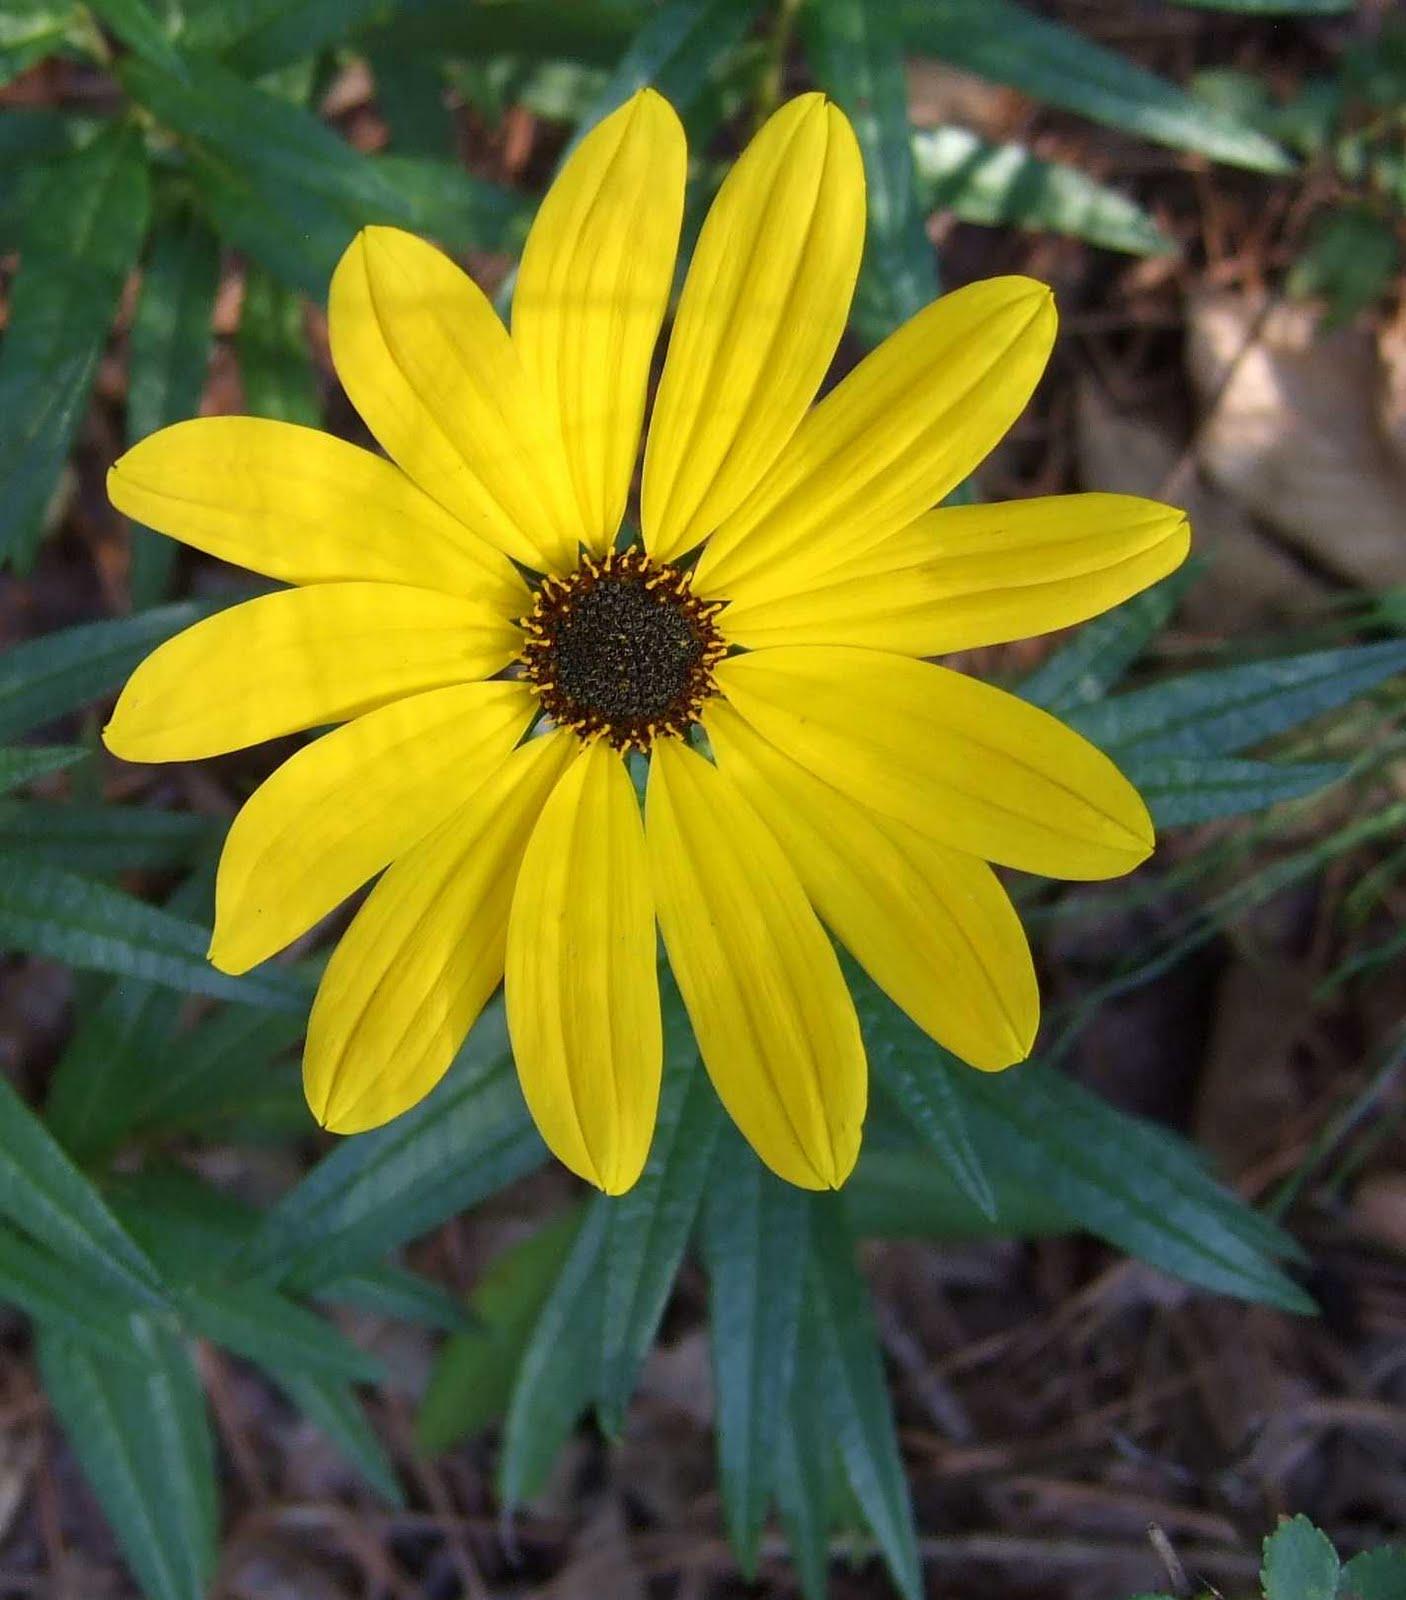 Using Georgia Native Plants Late Summer Yellows